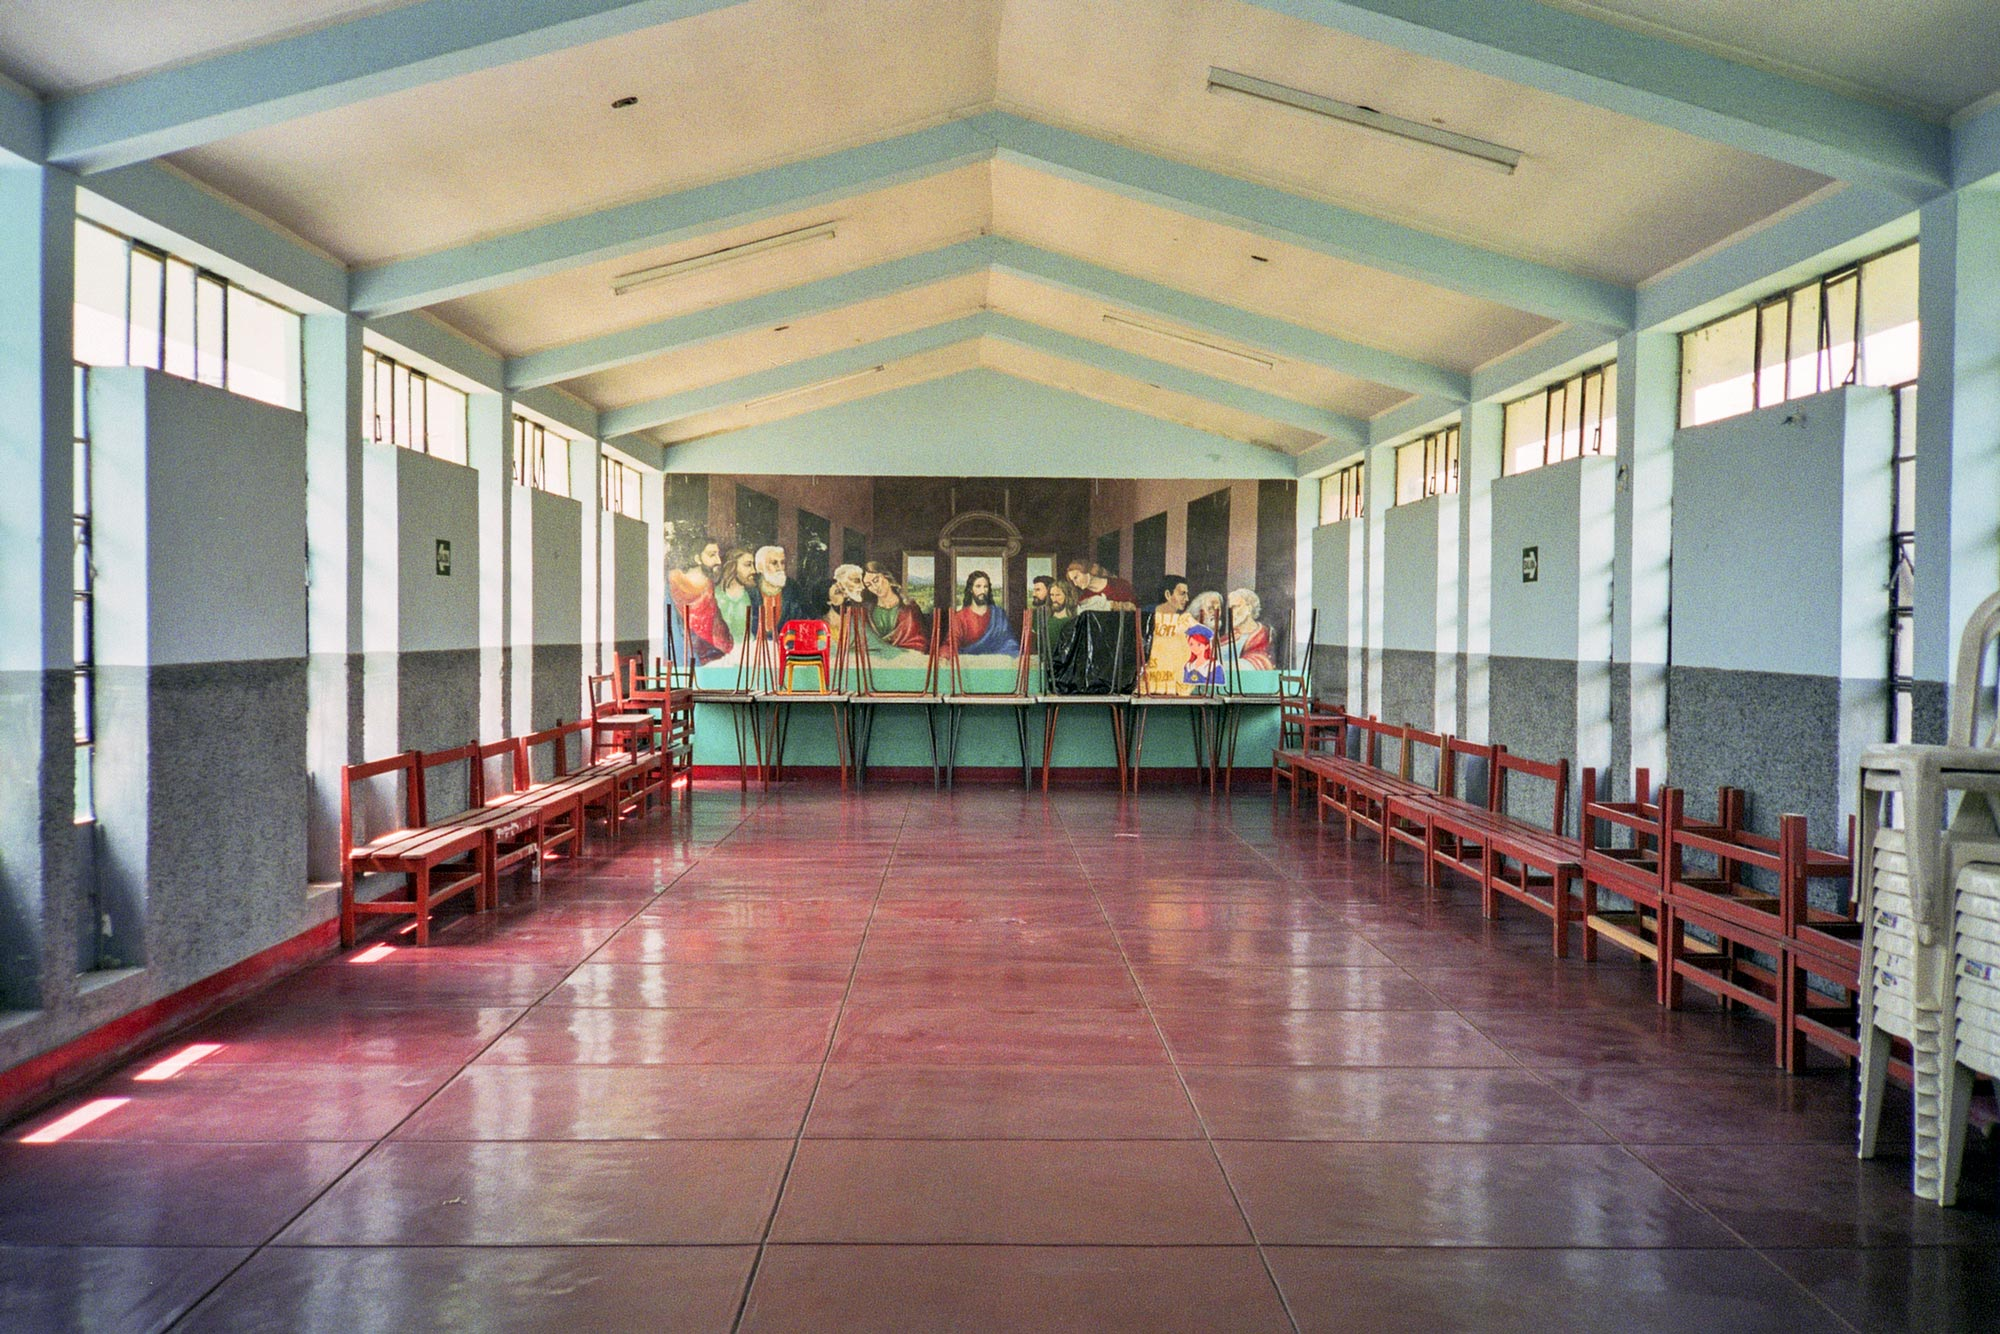 Peru Puericultorio dining room